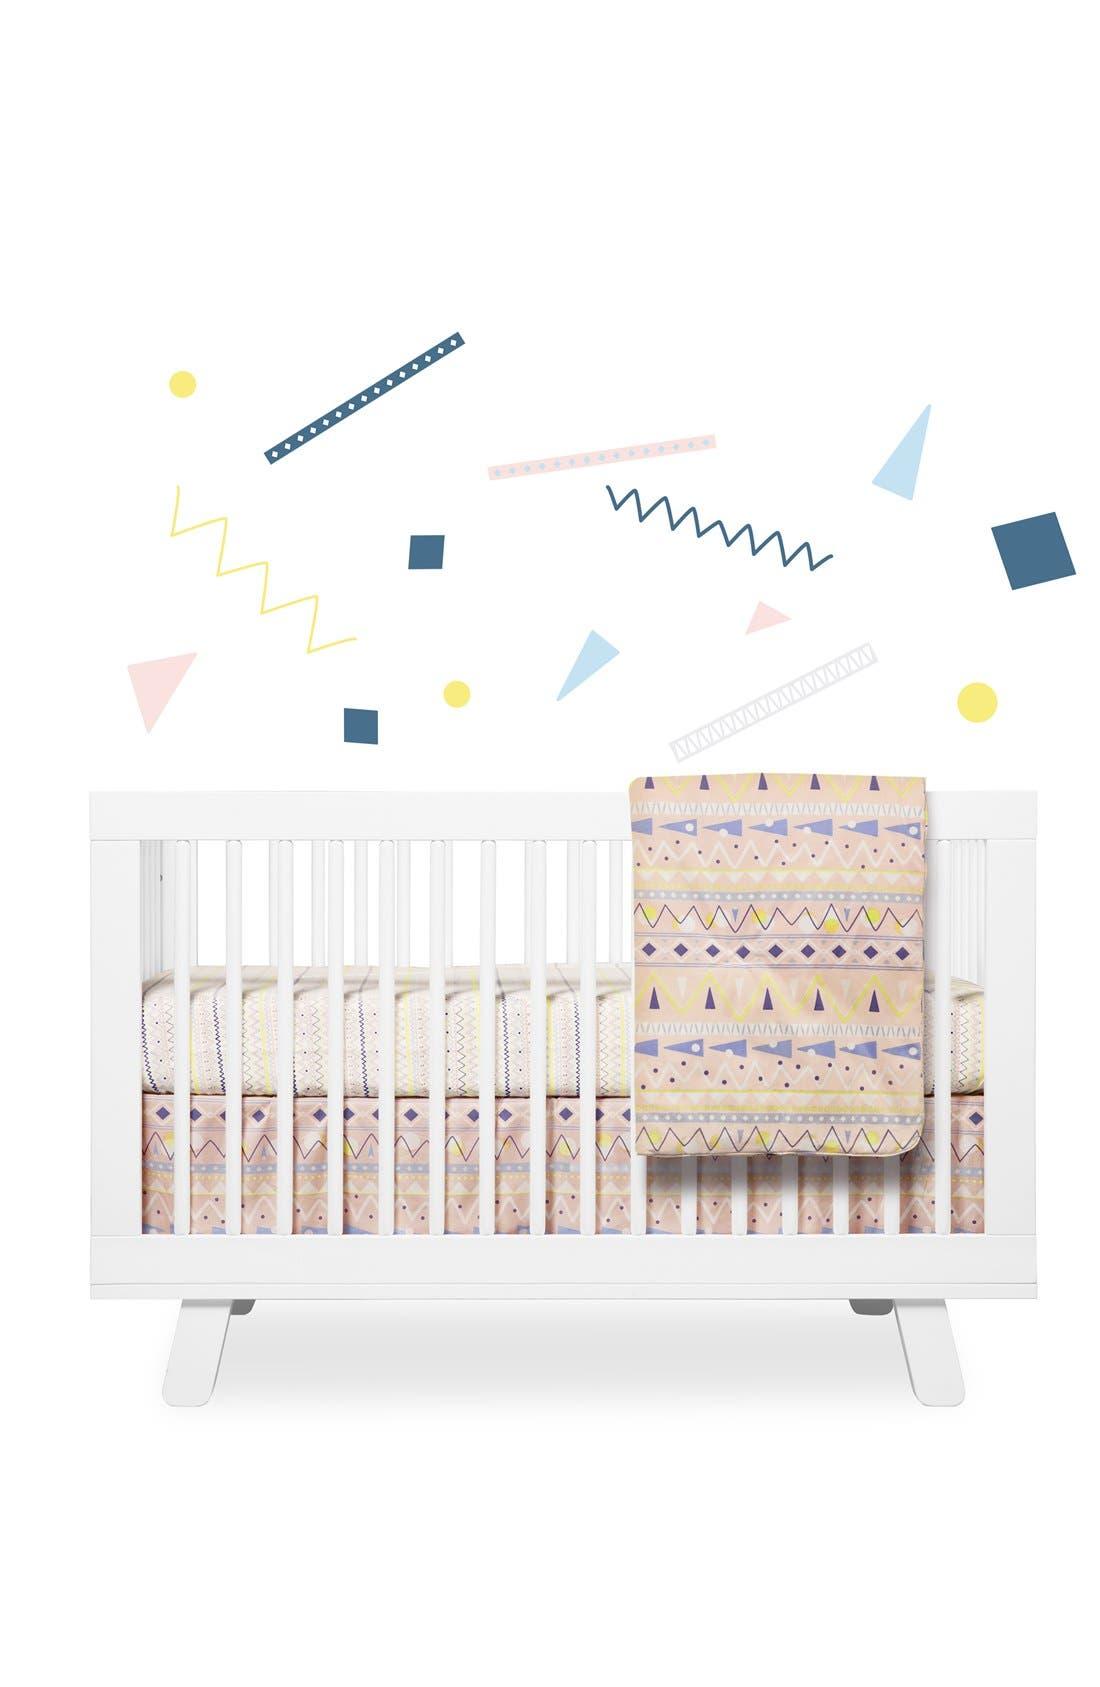 'Desert' Crib Sheet, Crib Skirt, Stroller Blanket & Wall Decals,                             Main thumbnail 1, color,                             900